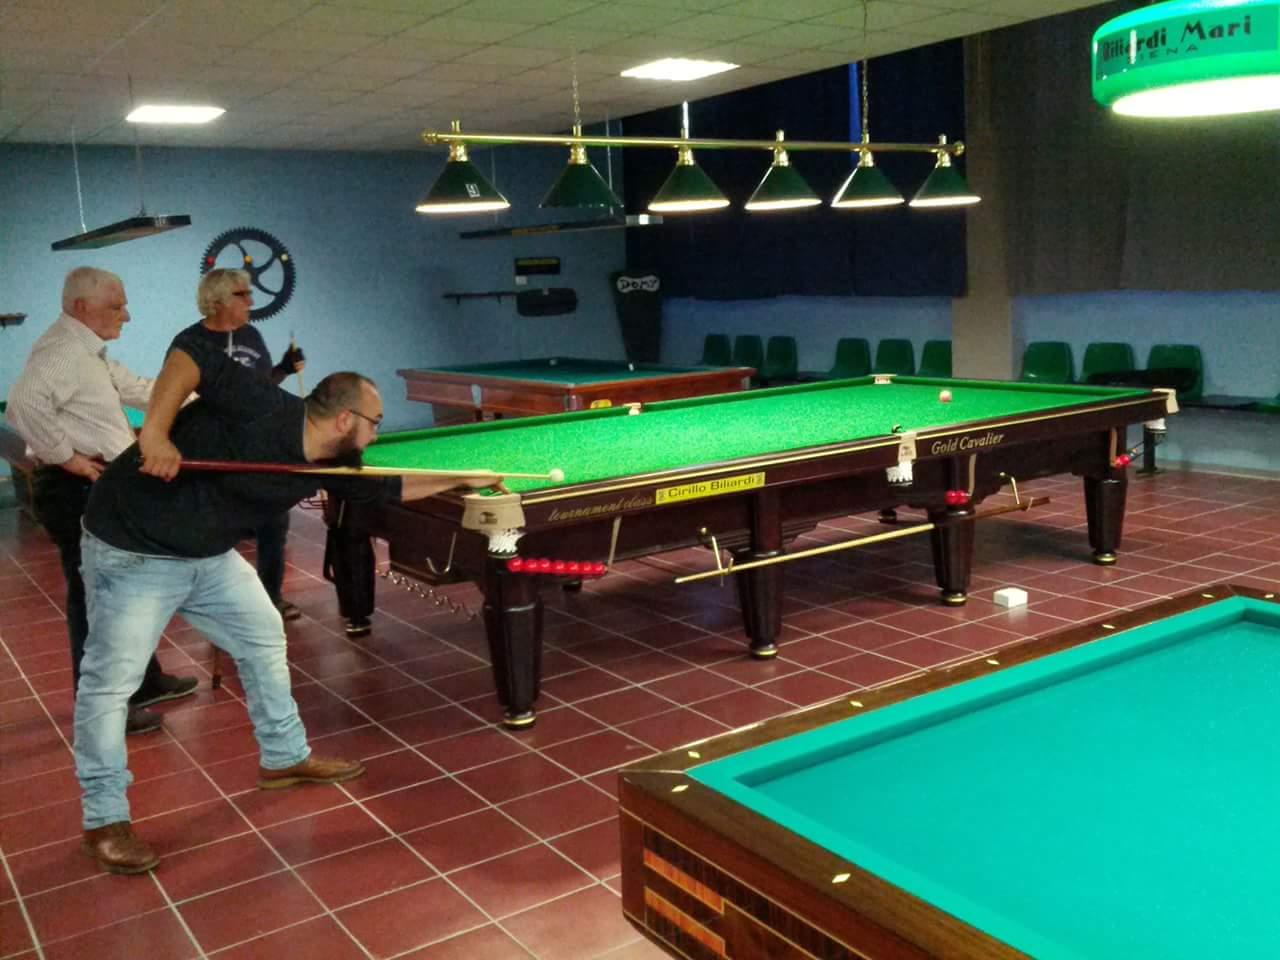 Sala Da Biliardo Pavia : Biliardo pool olympico biliardi cavicchi